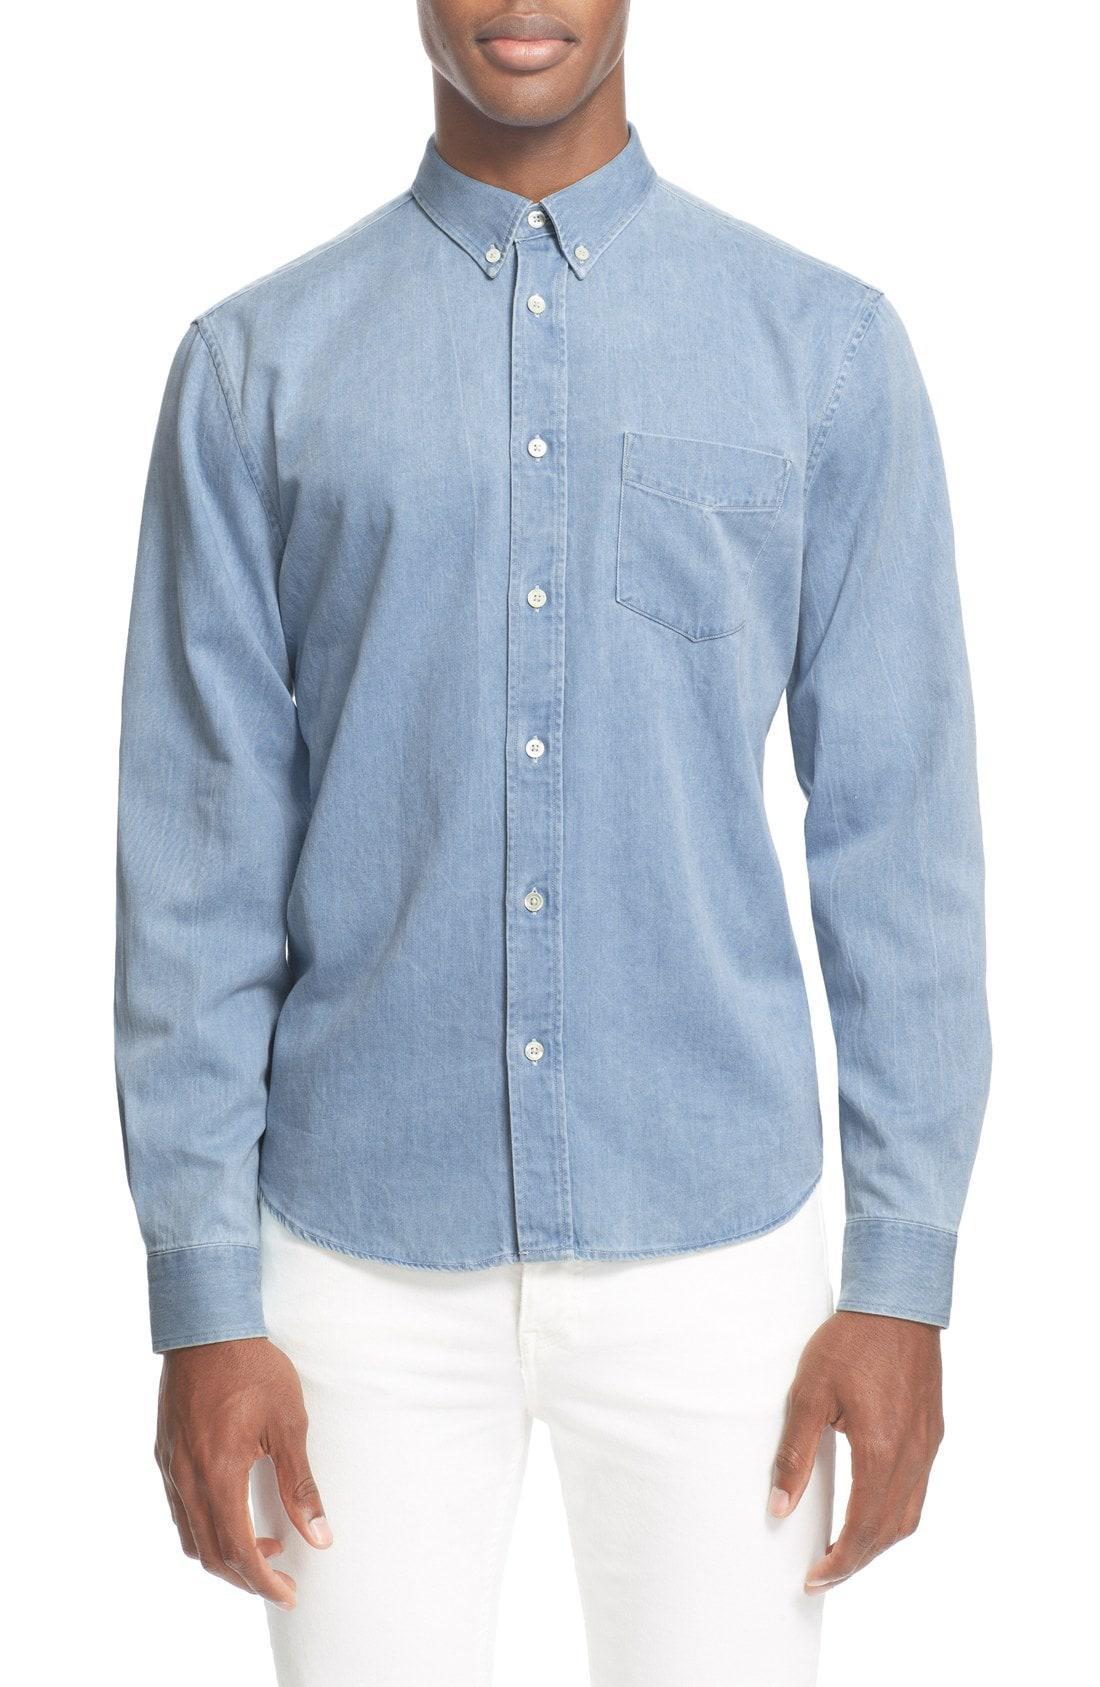 6d2d9016f0 Lyst - Acne  isherwood  Denim Shirt in Blue for Men